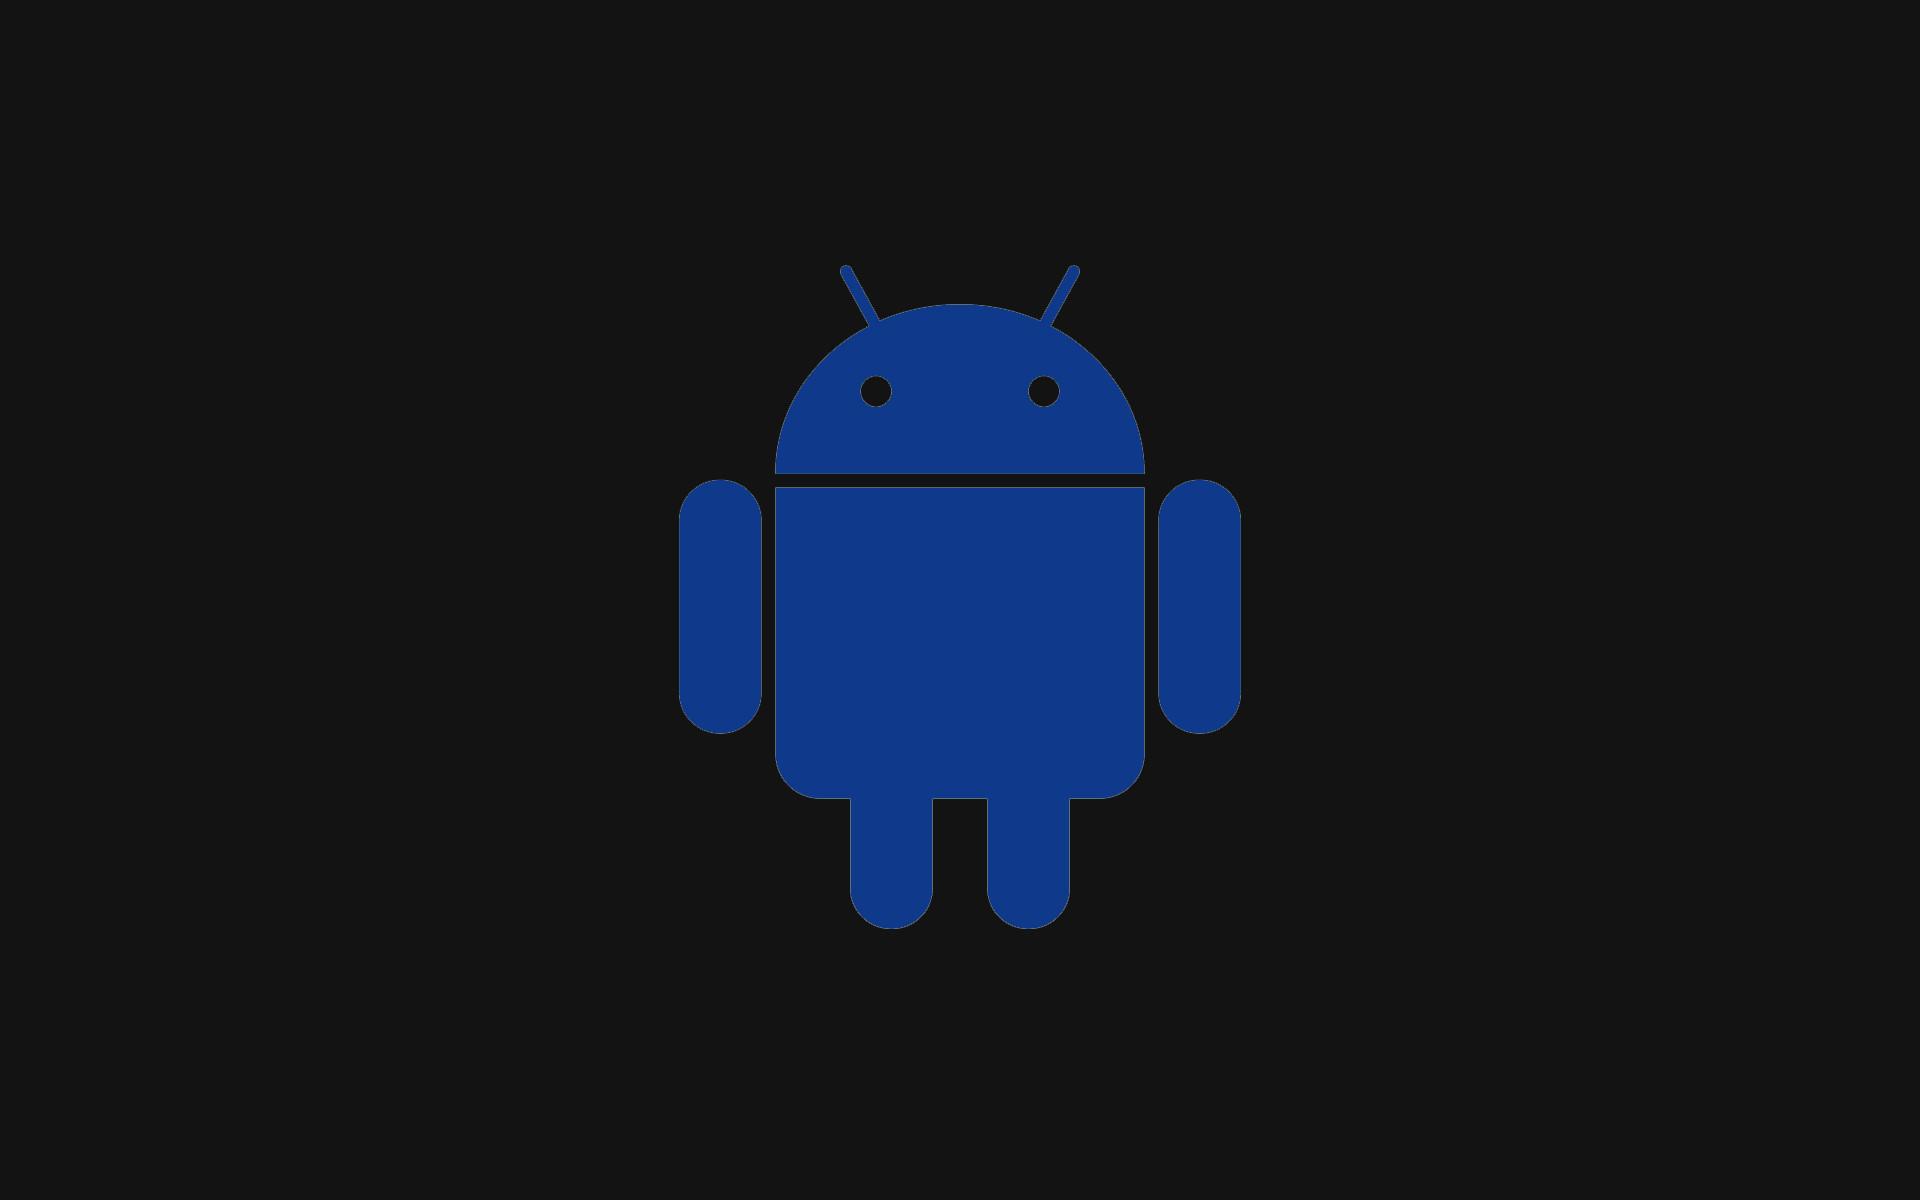 Blue Android And Black Background Wallpaper Desktop.